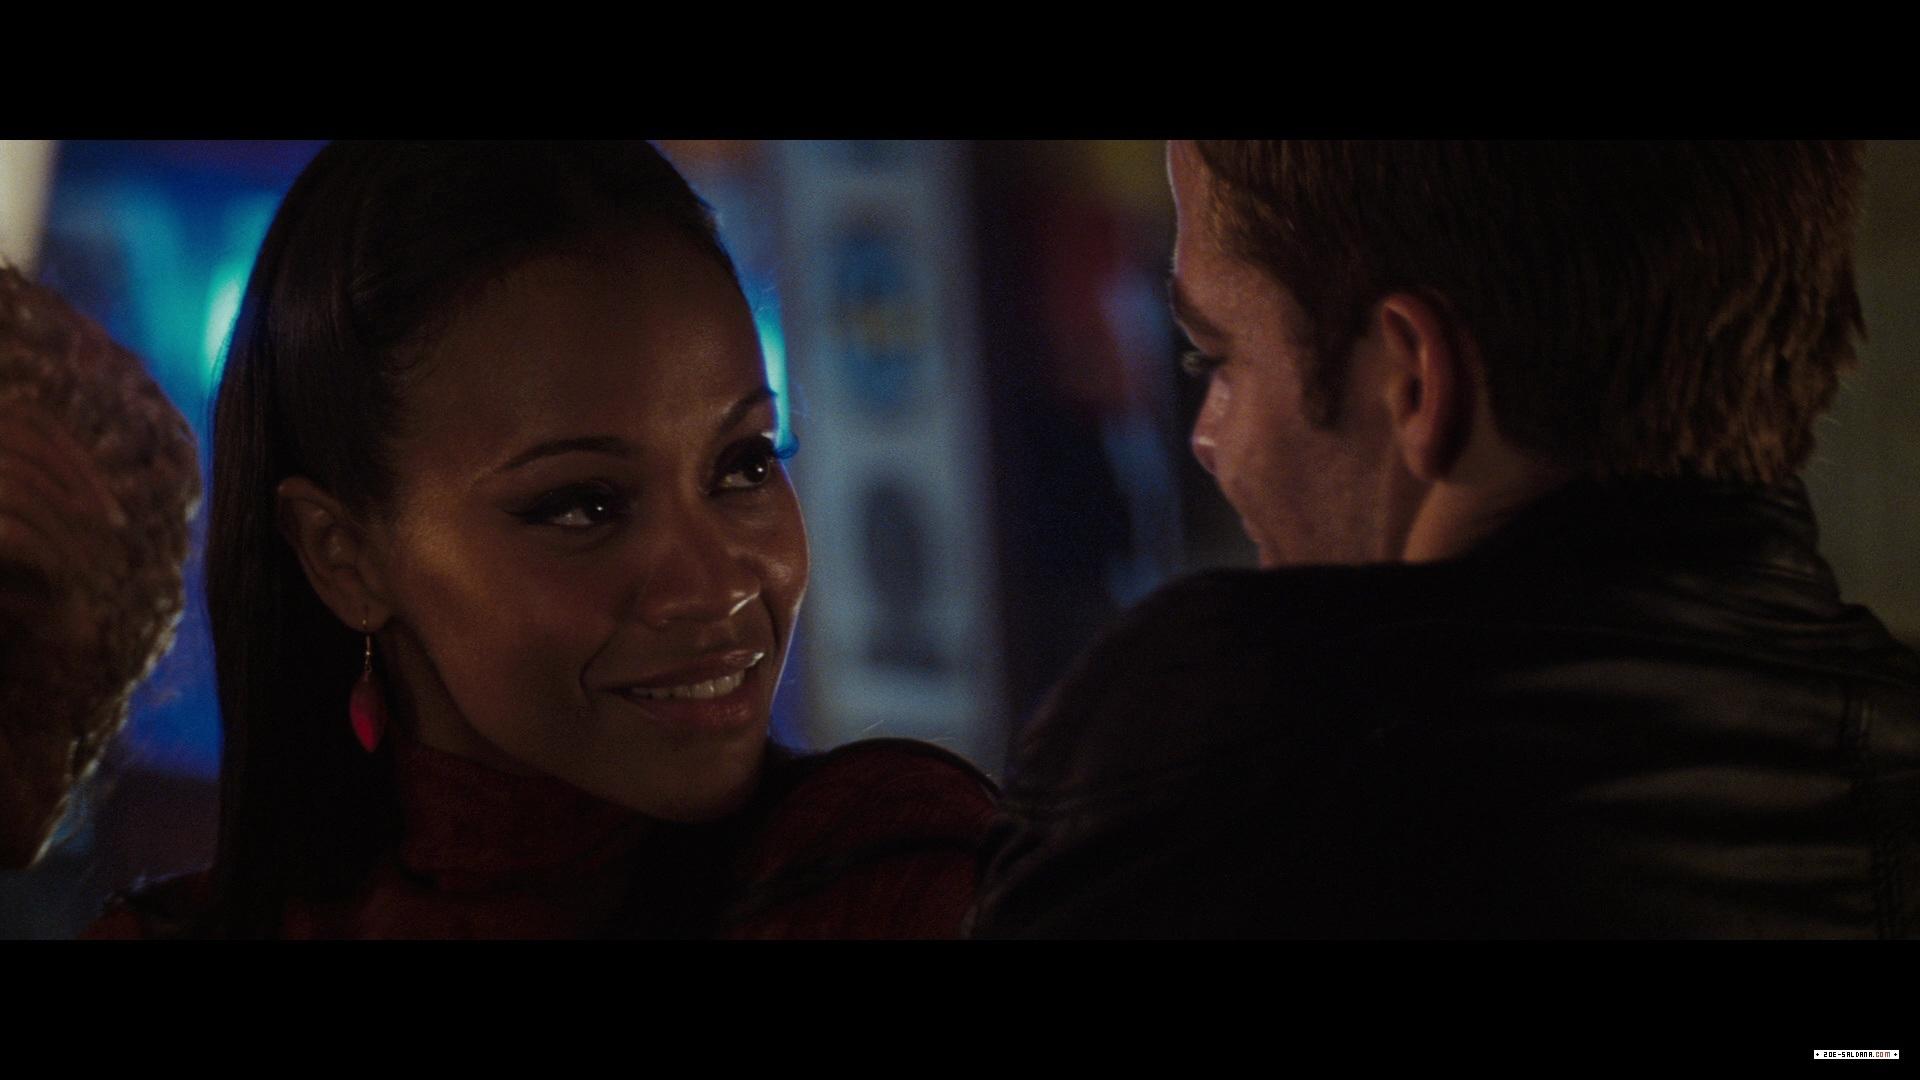 Zoe-Saldana-Star-Trek-screencaps-zoe-saldana-9859535-1920-1080 jpgZoe Saldana Star Trek